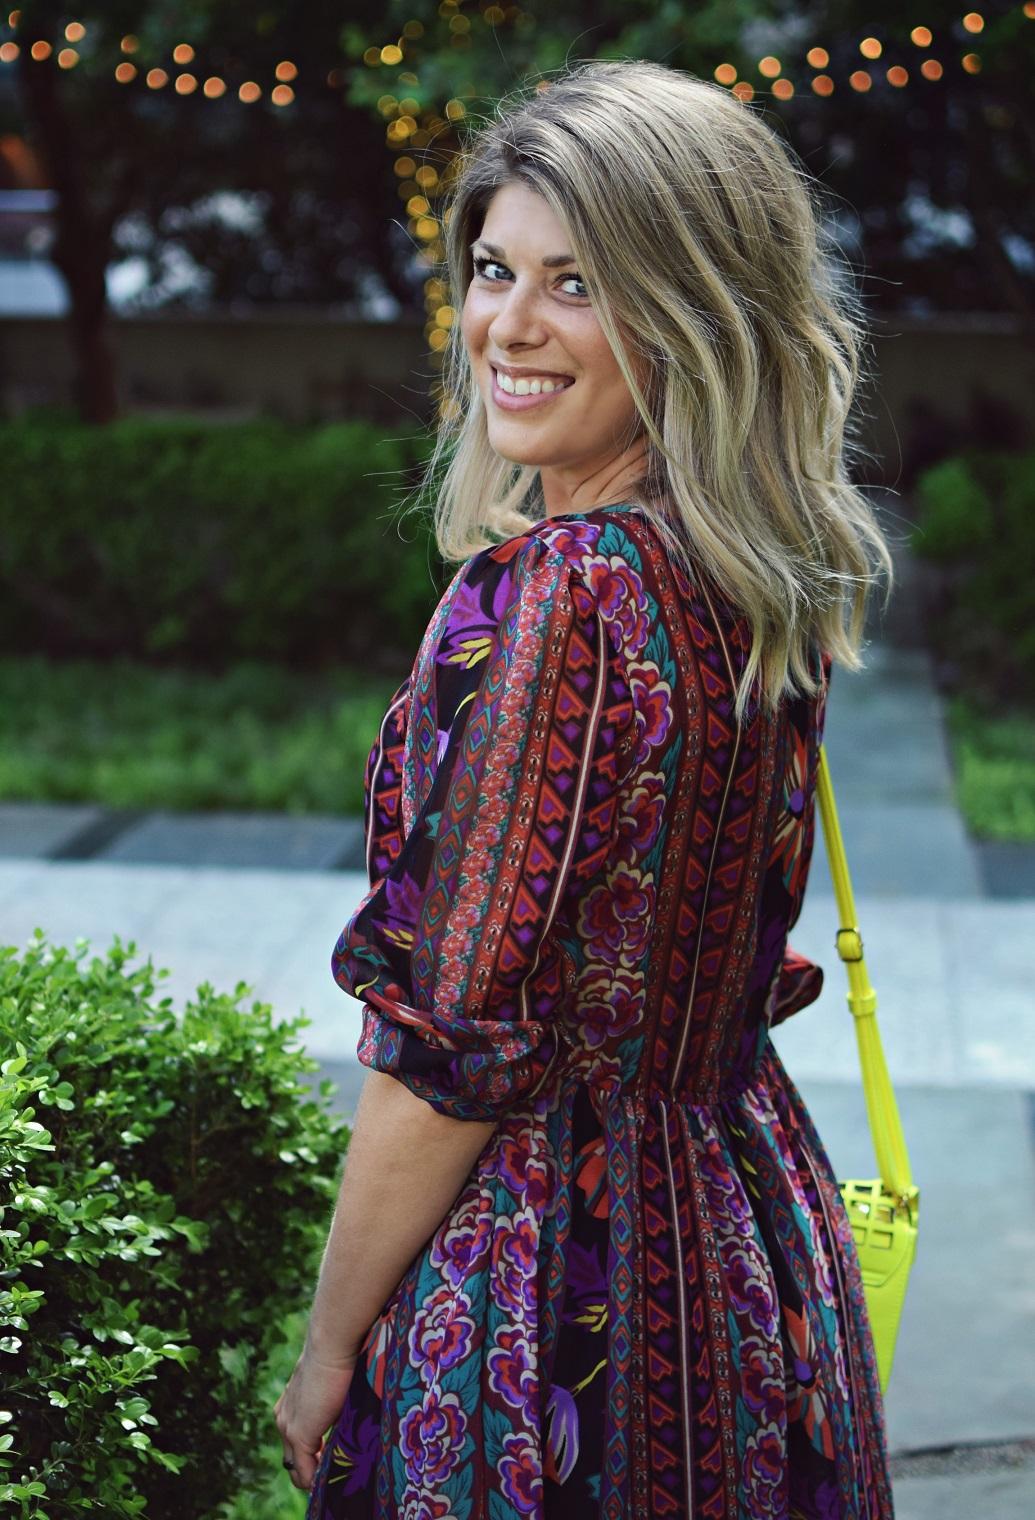 boho dress for a blogger meet up